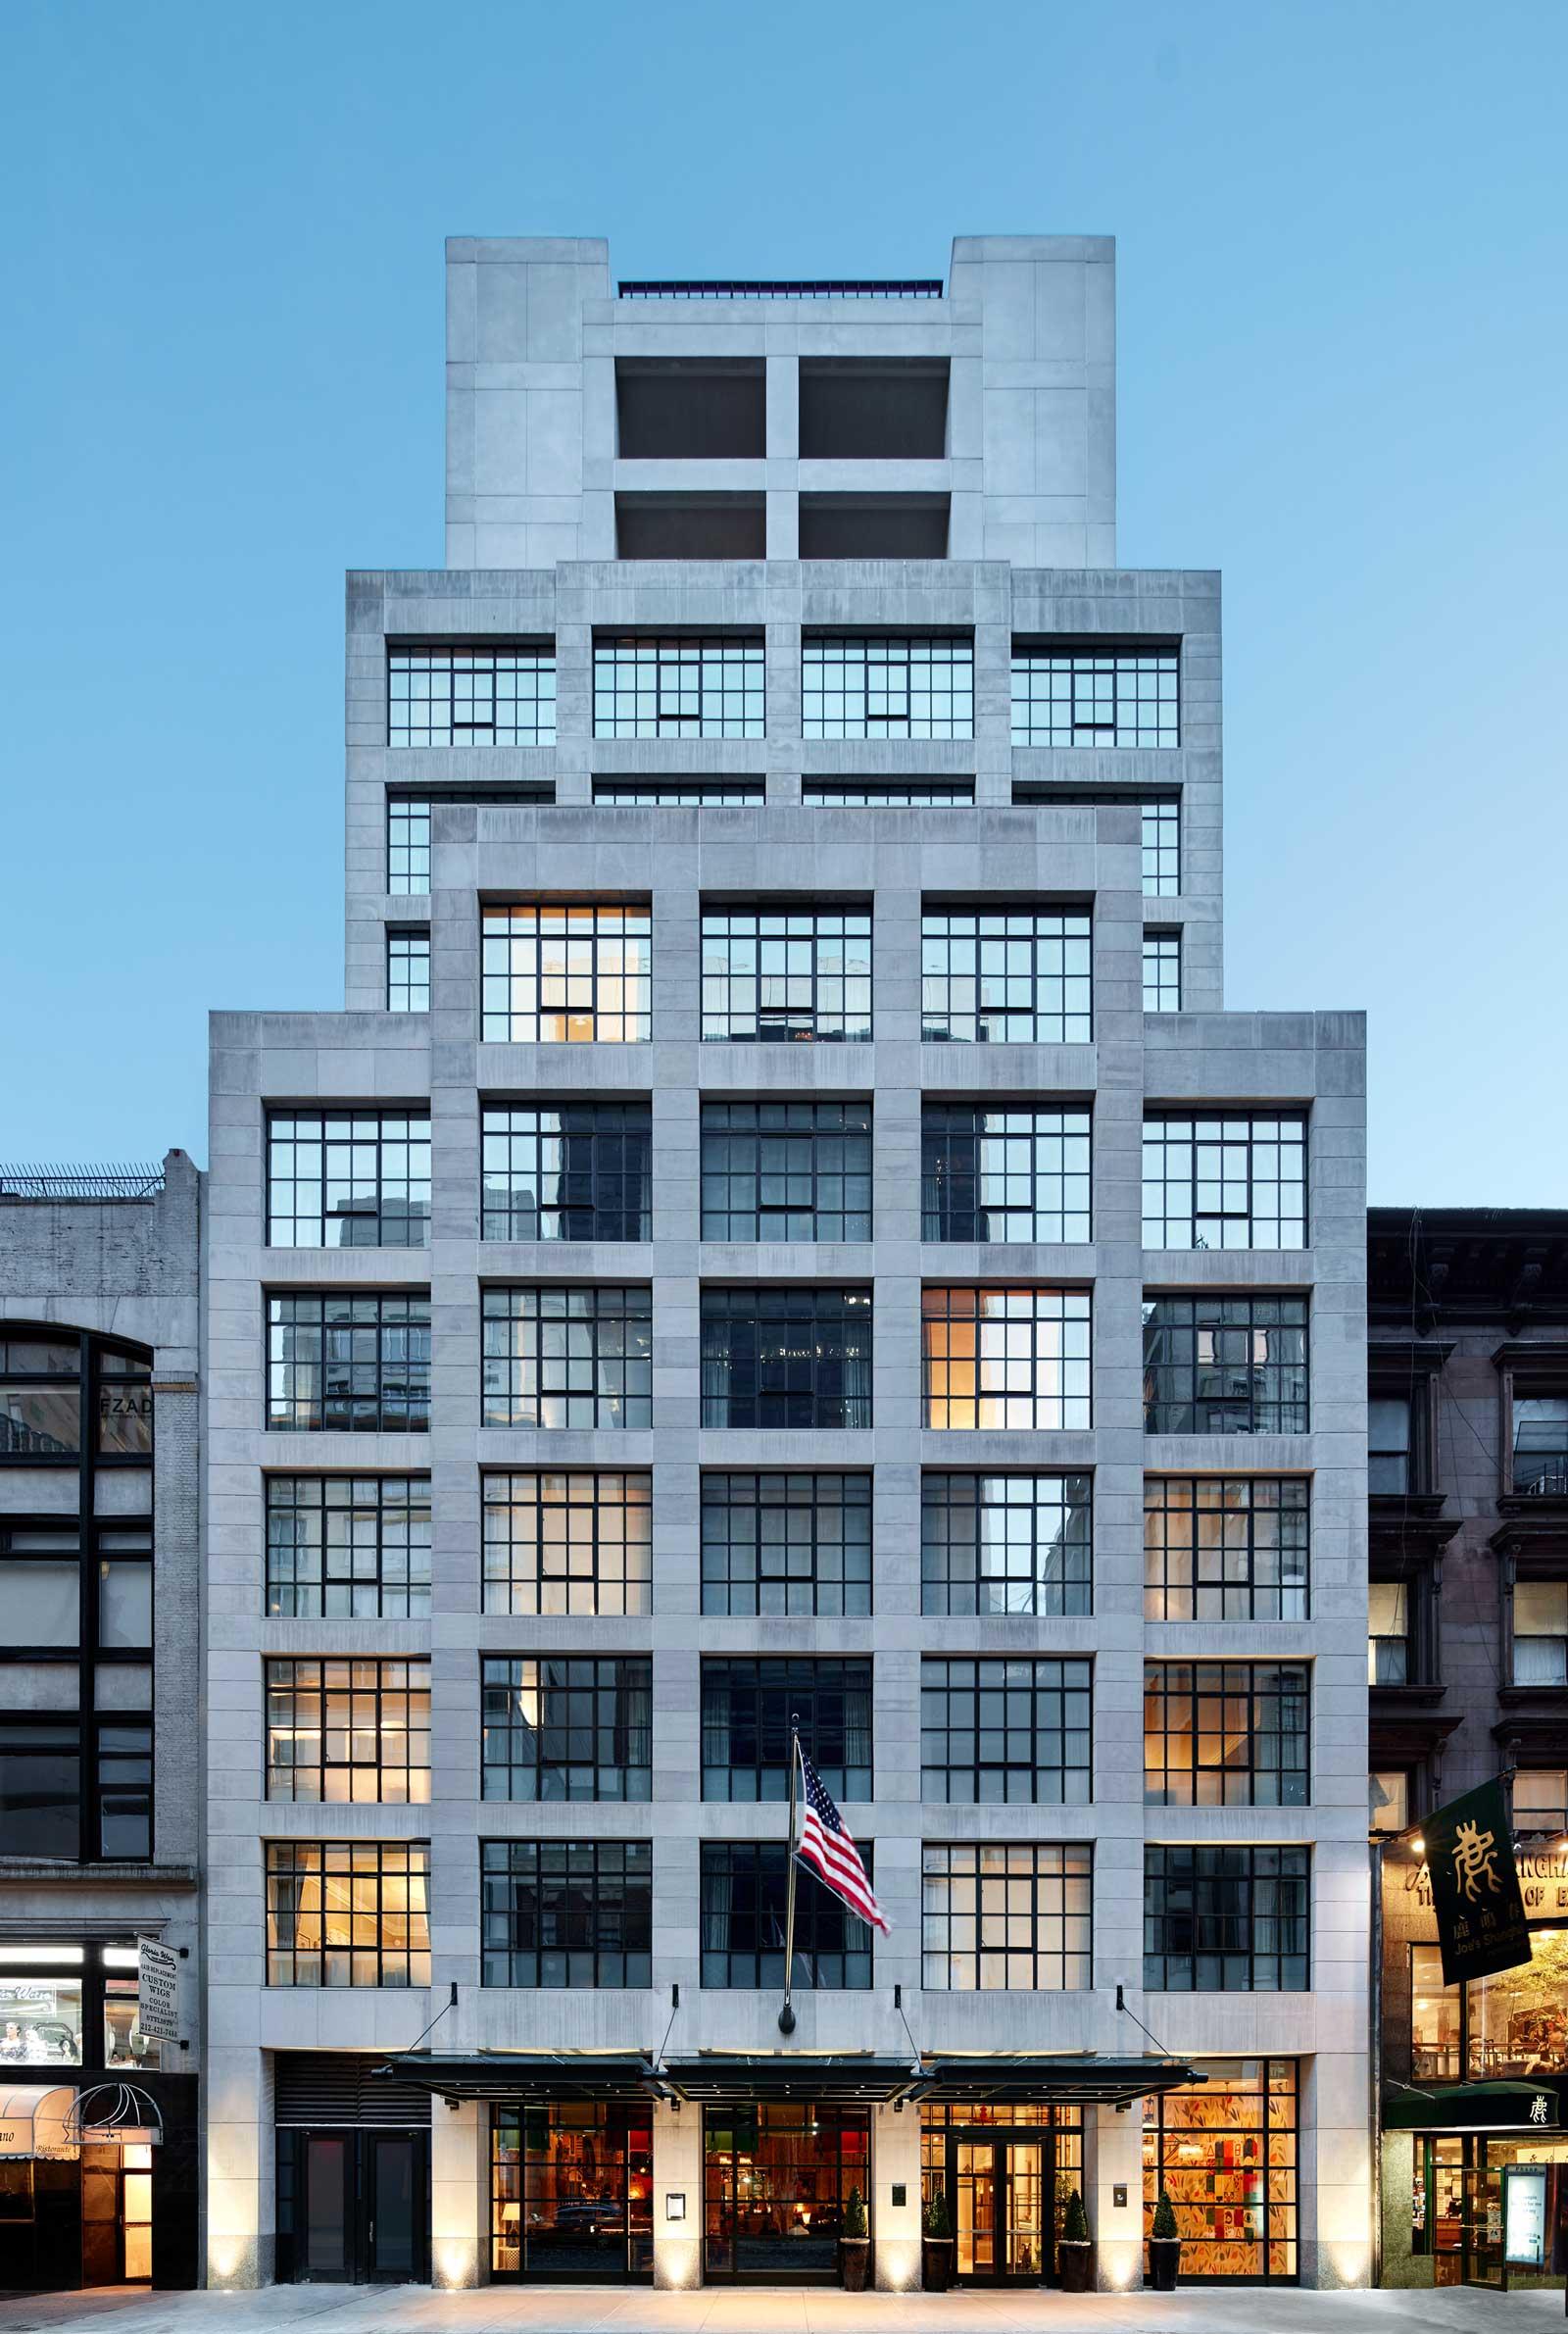 Source: http://trendland.com/whitby-hotel-new-york/